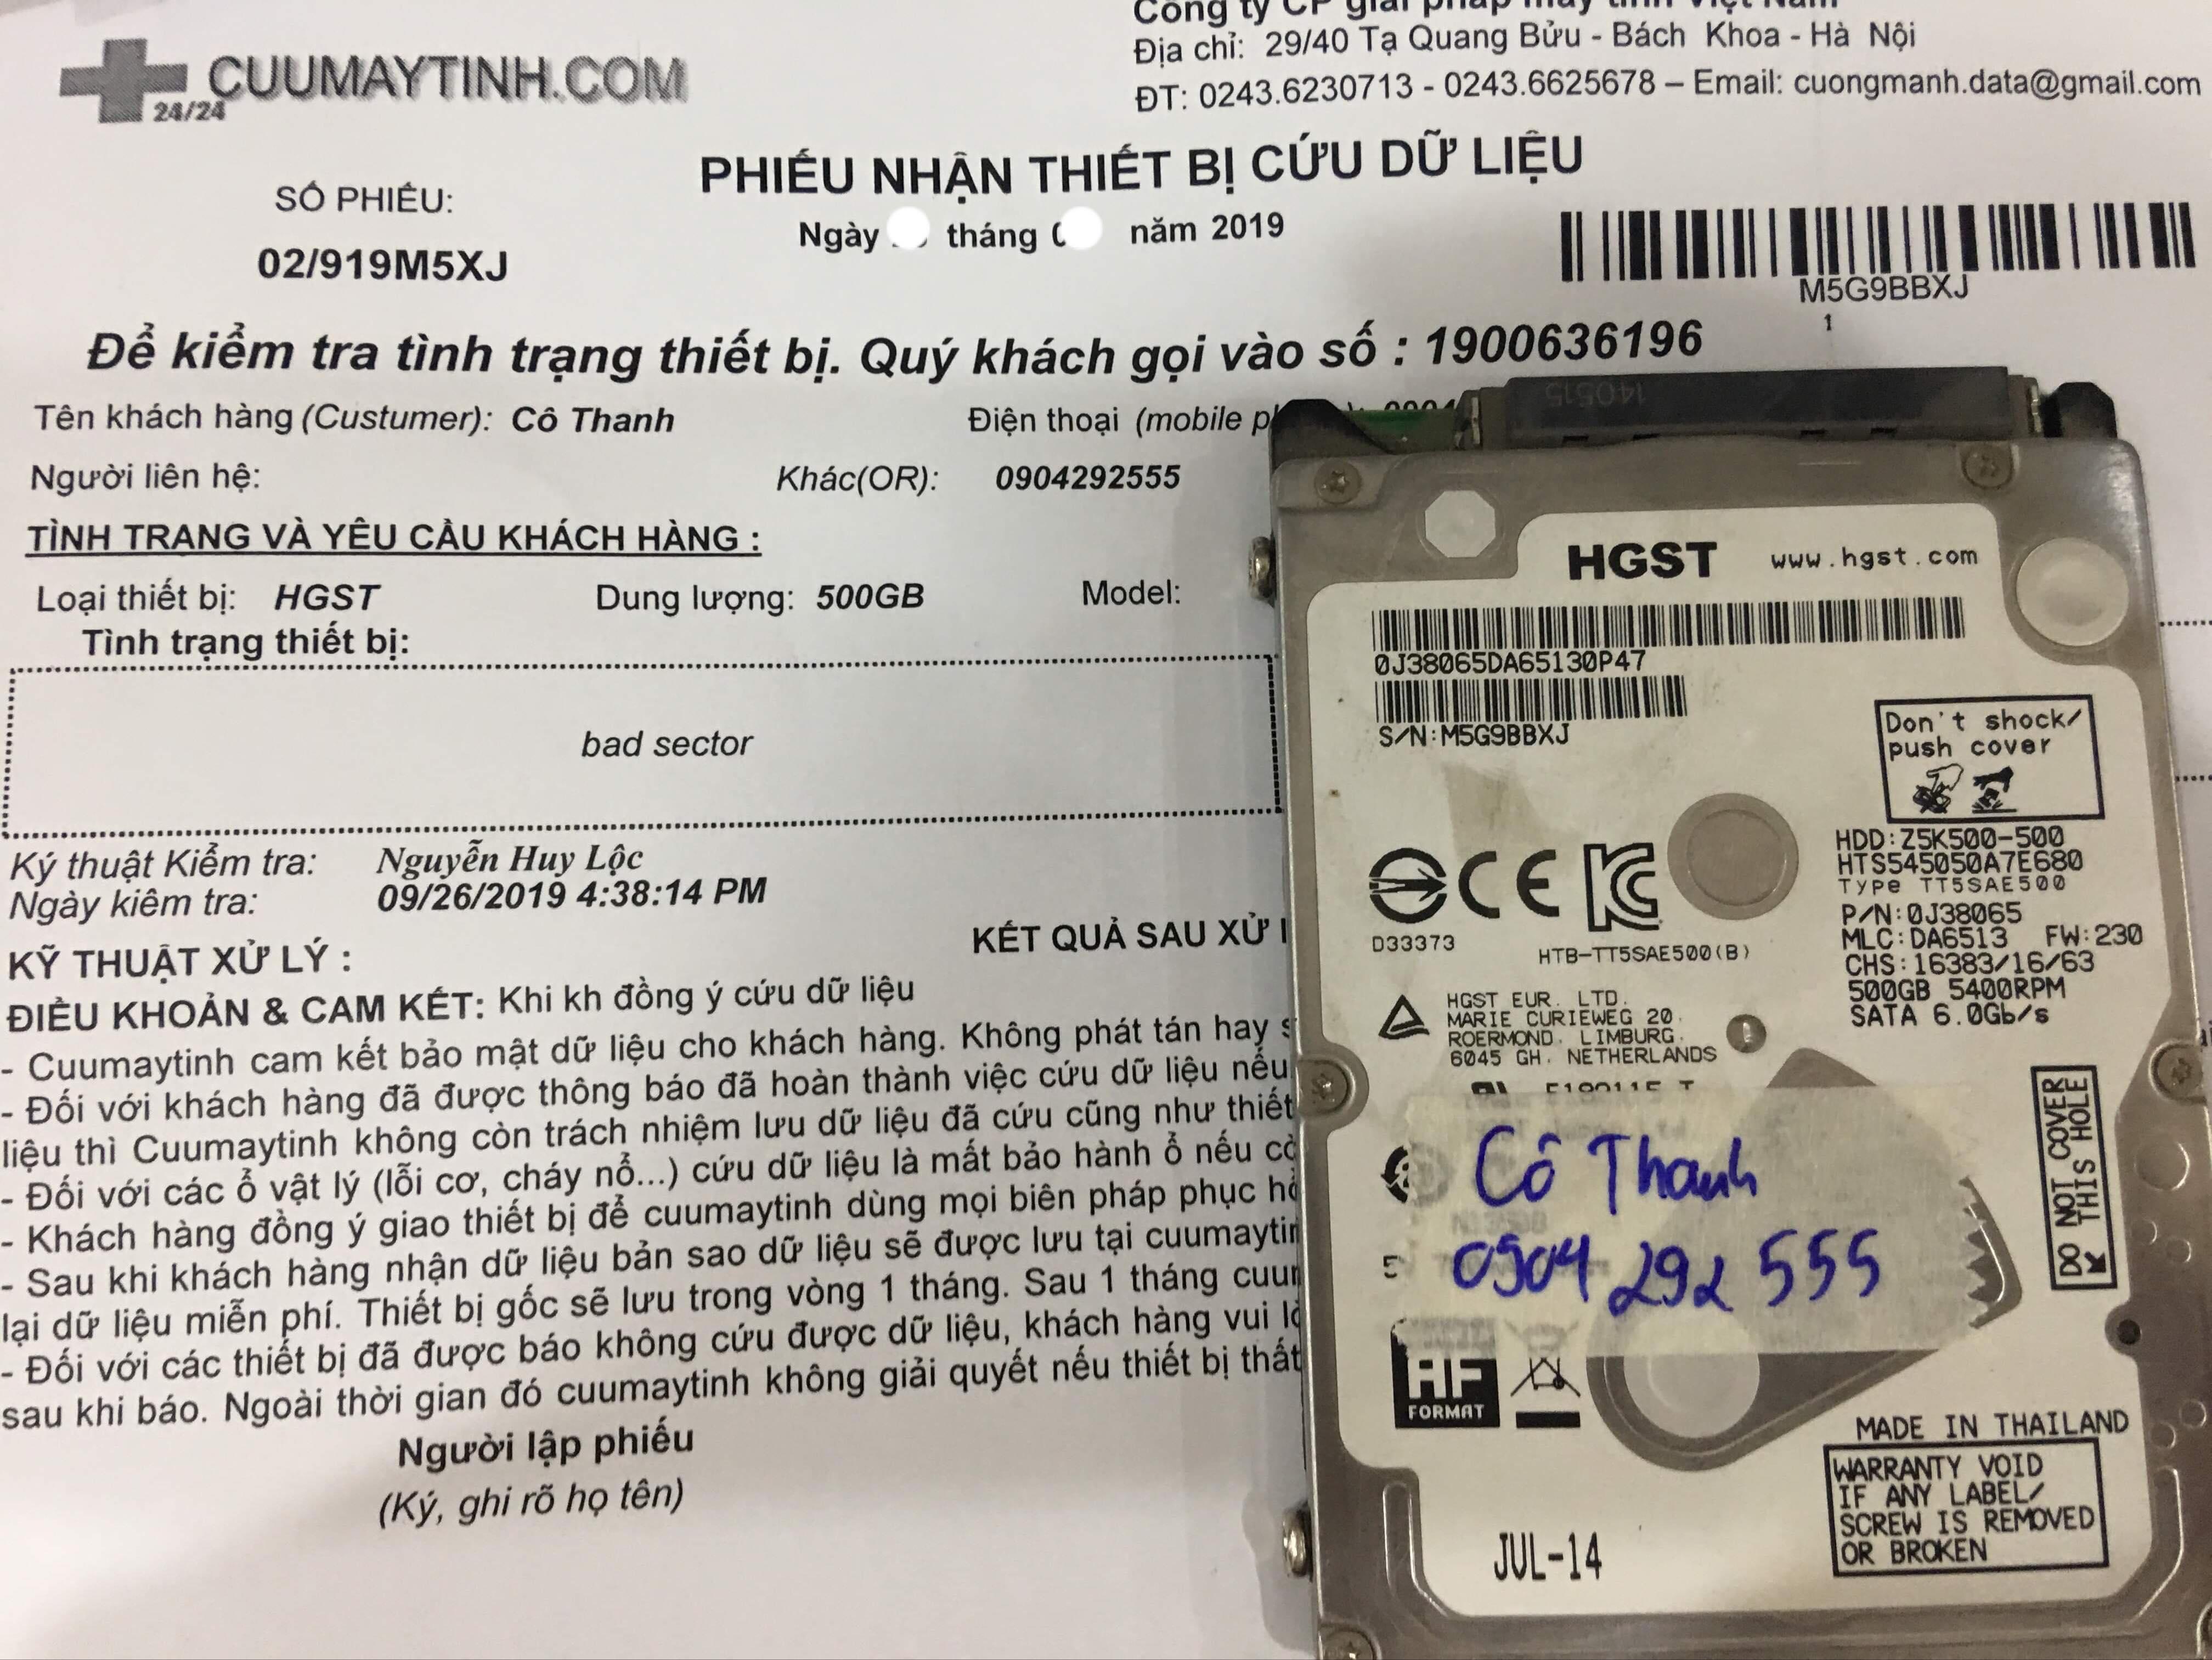 Cứu dữ liệu ổ cứng HGST 500GB bad sector 03/10/2019 - cuumaytinh